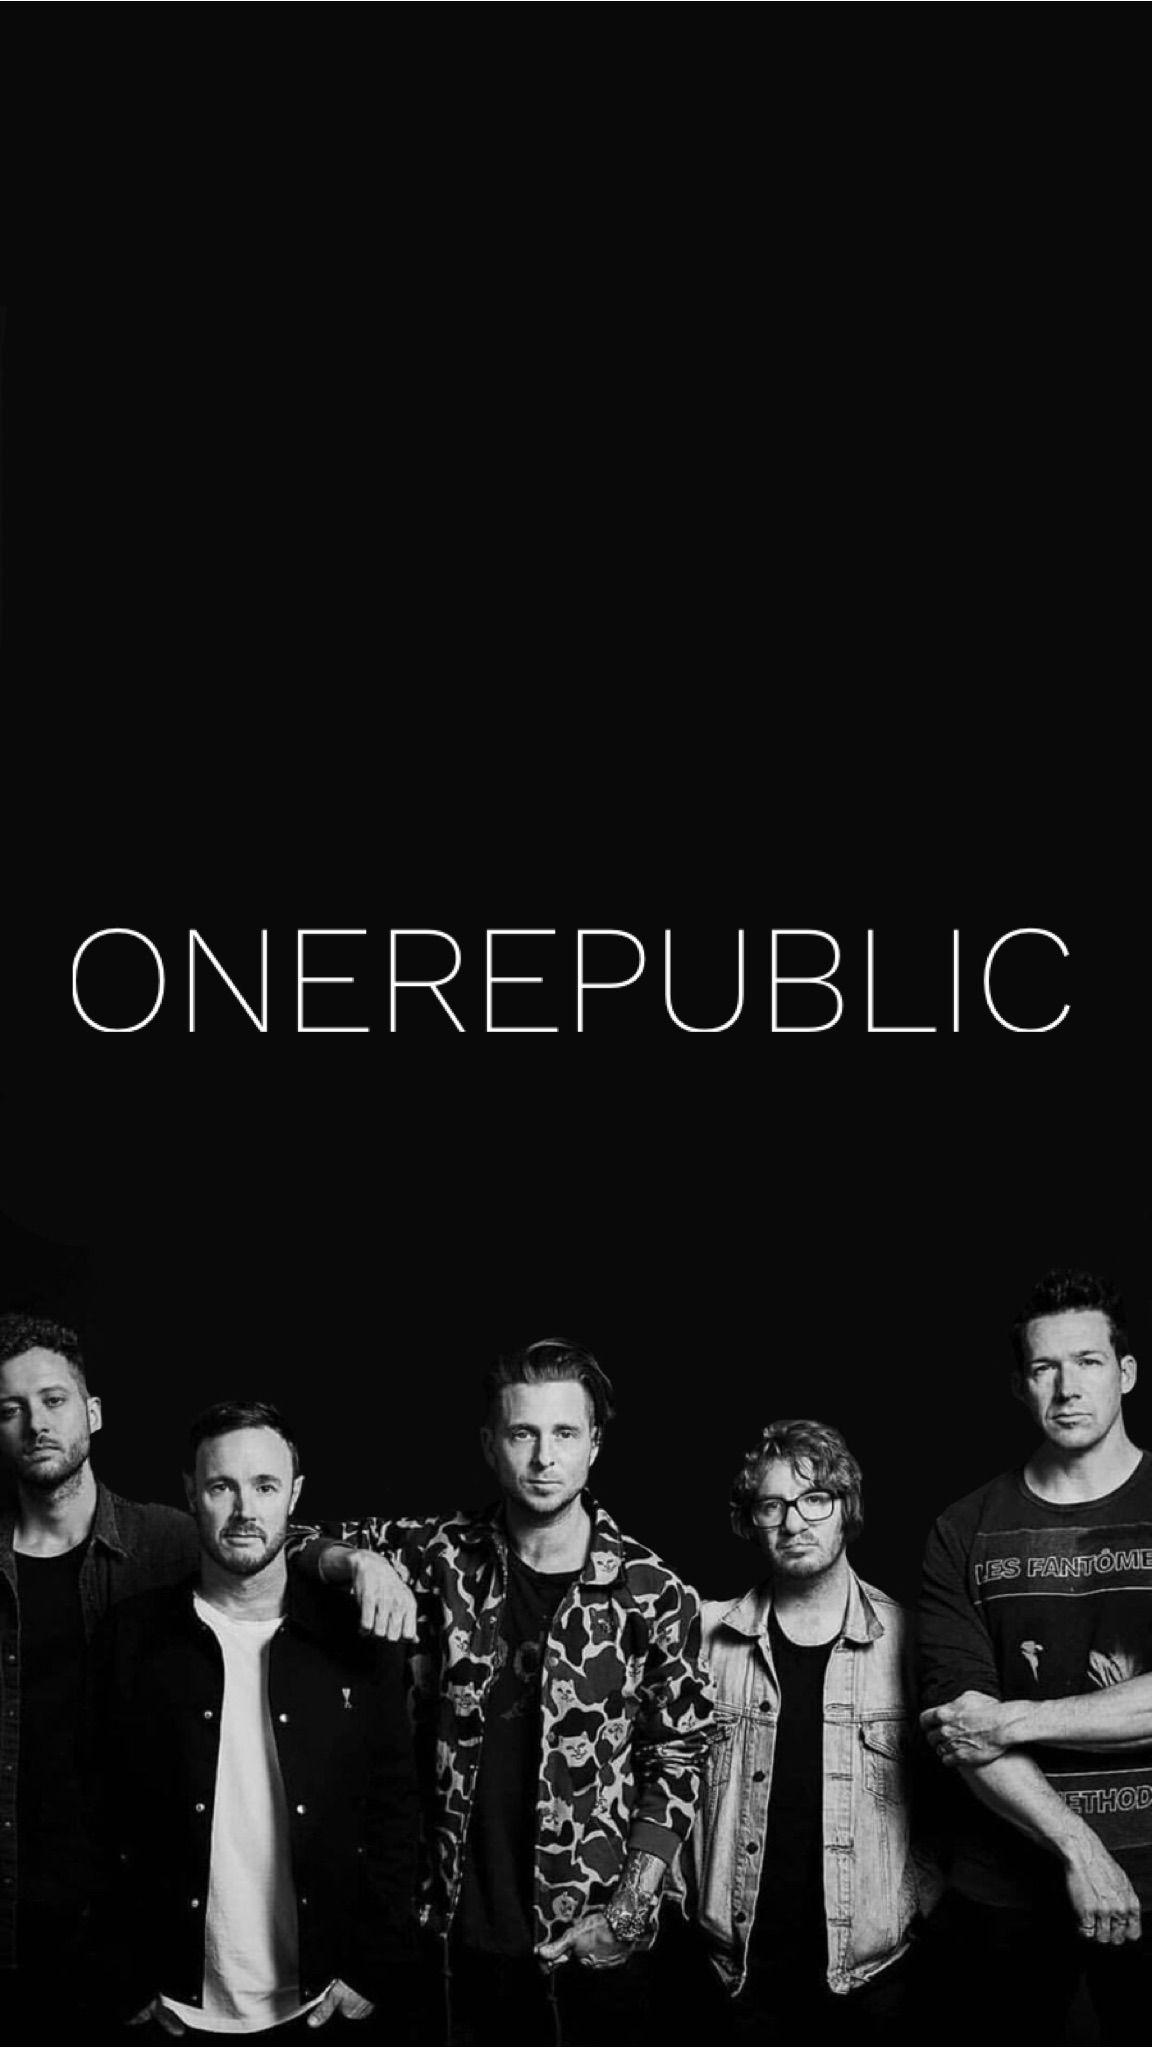 Pin By Kieran Wilson On My Edits One Republic Band One Republic Lyrics One Republic